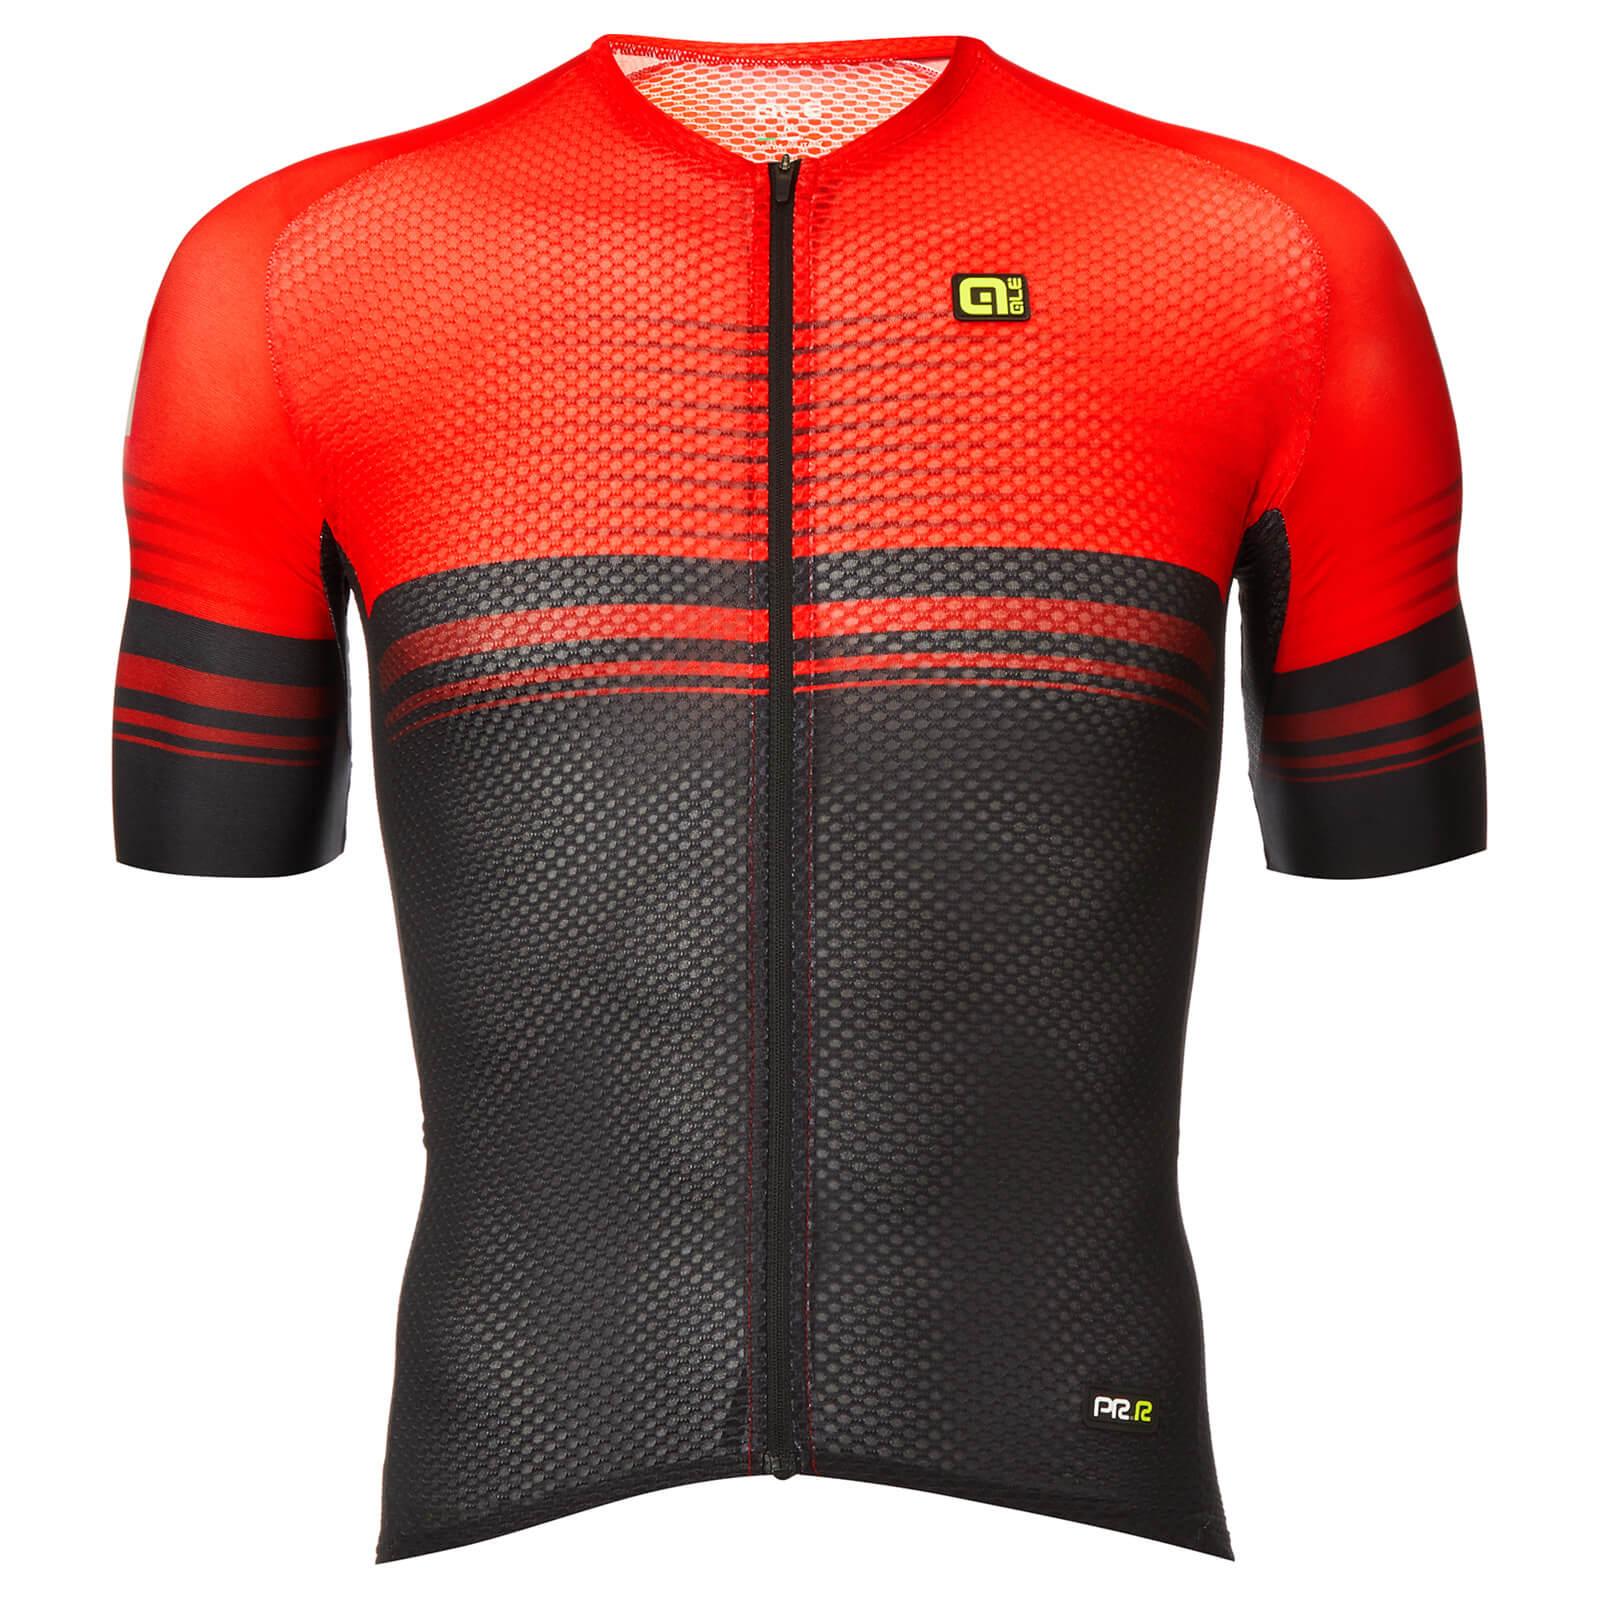 Alé Graphics PRR Slide Jersey - XL - Black/Red